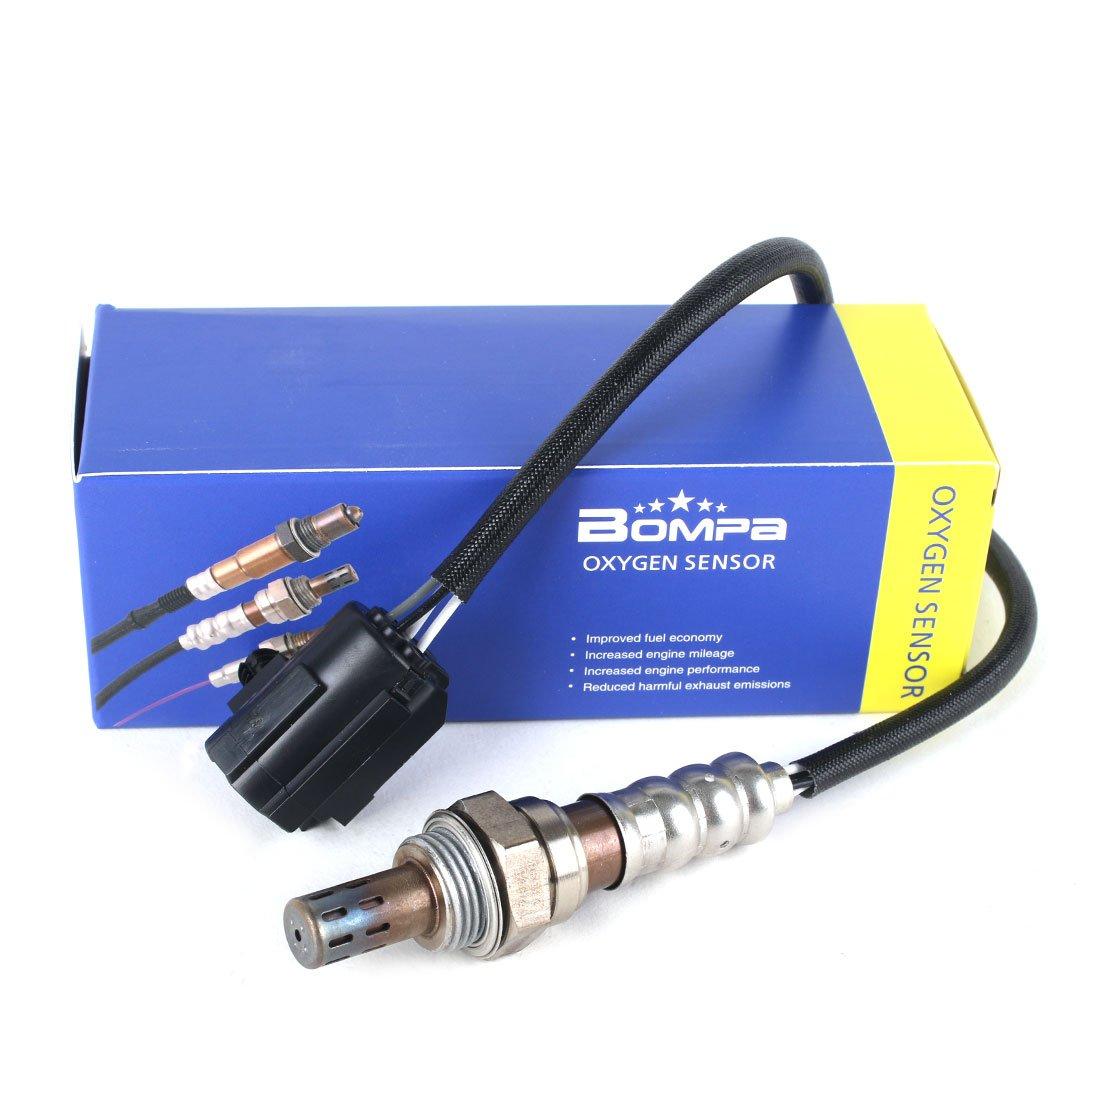 Amazon.com: Bompa Oxygen Sensor 4 Wire for CHRYSLER Cirrus ...